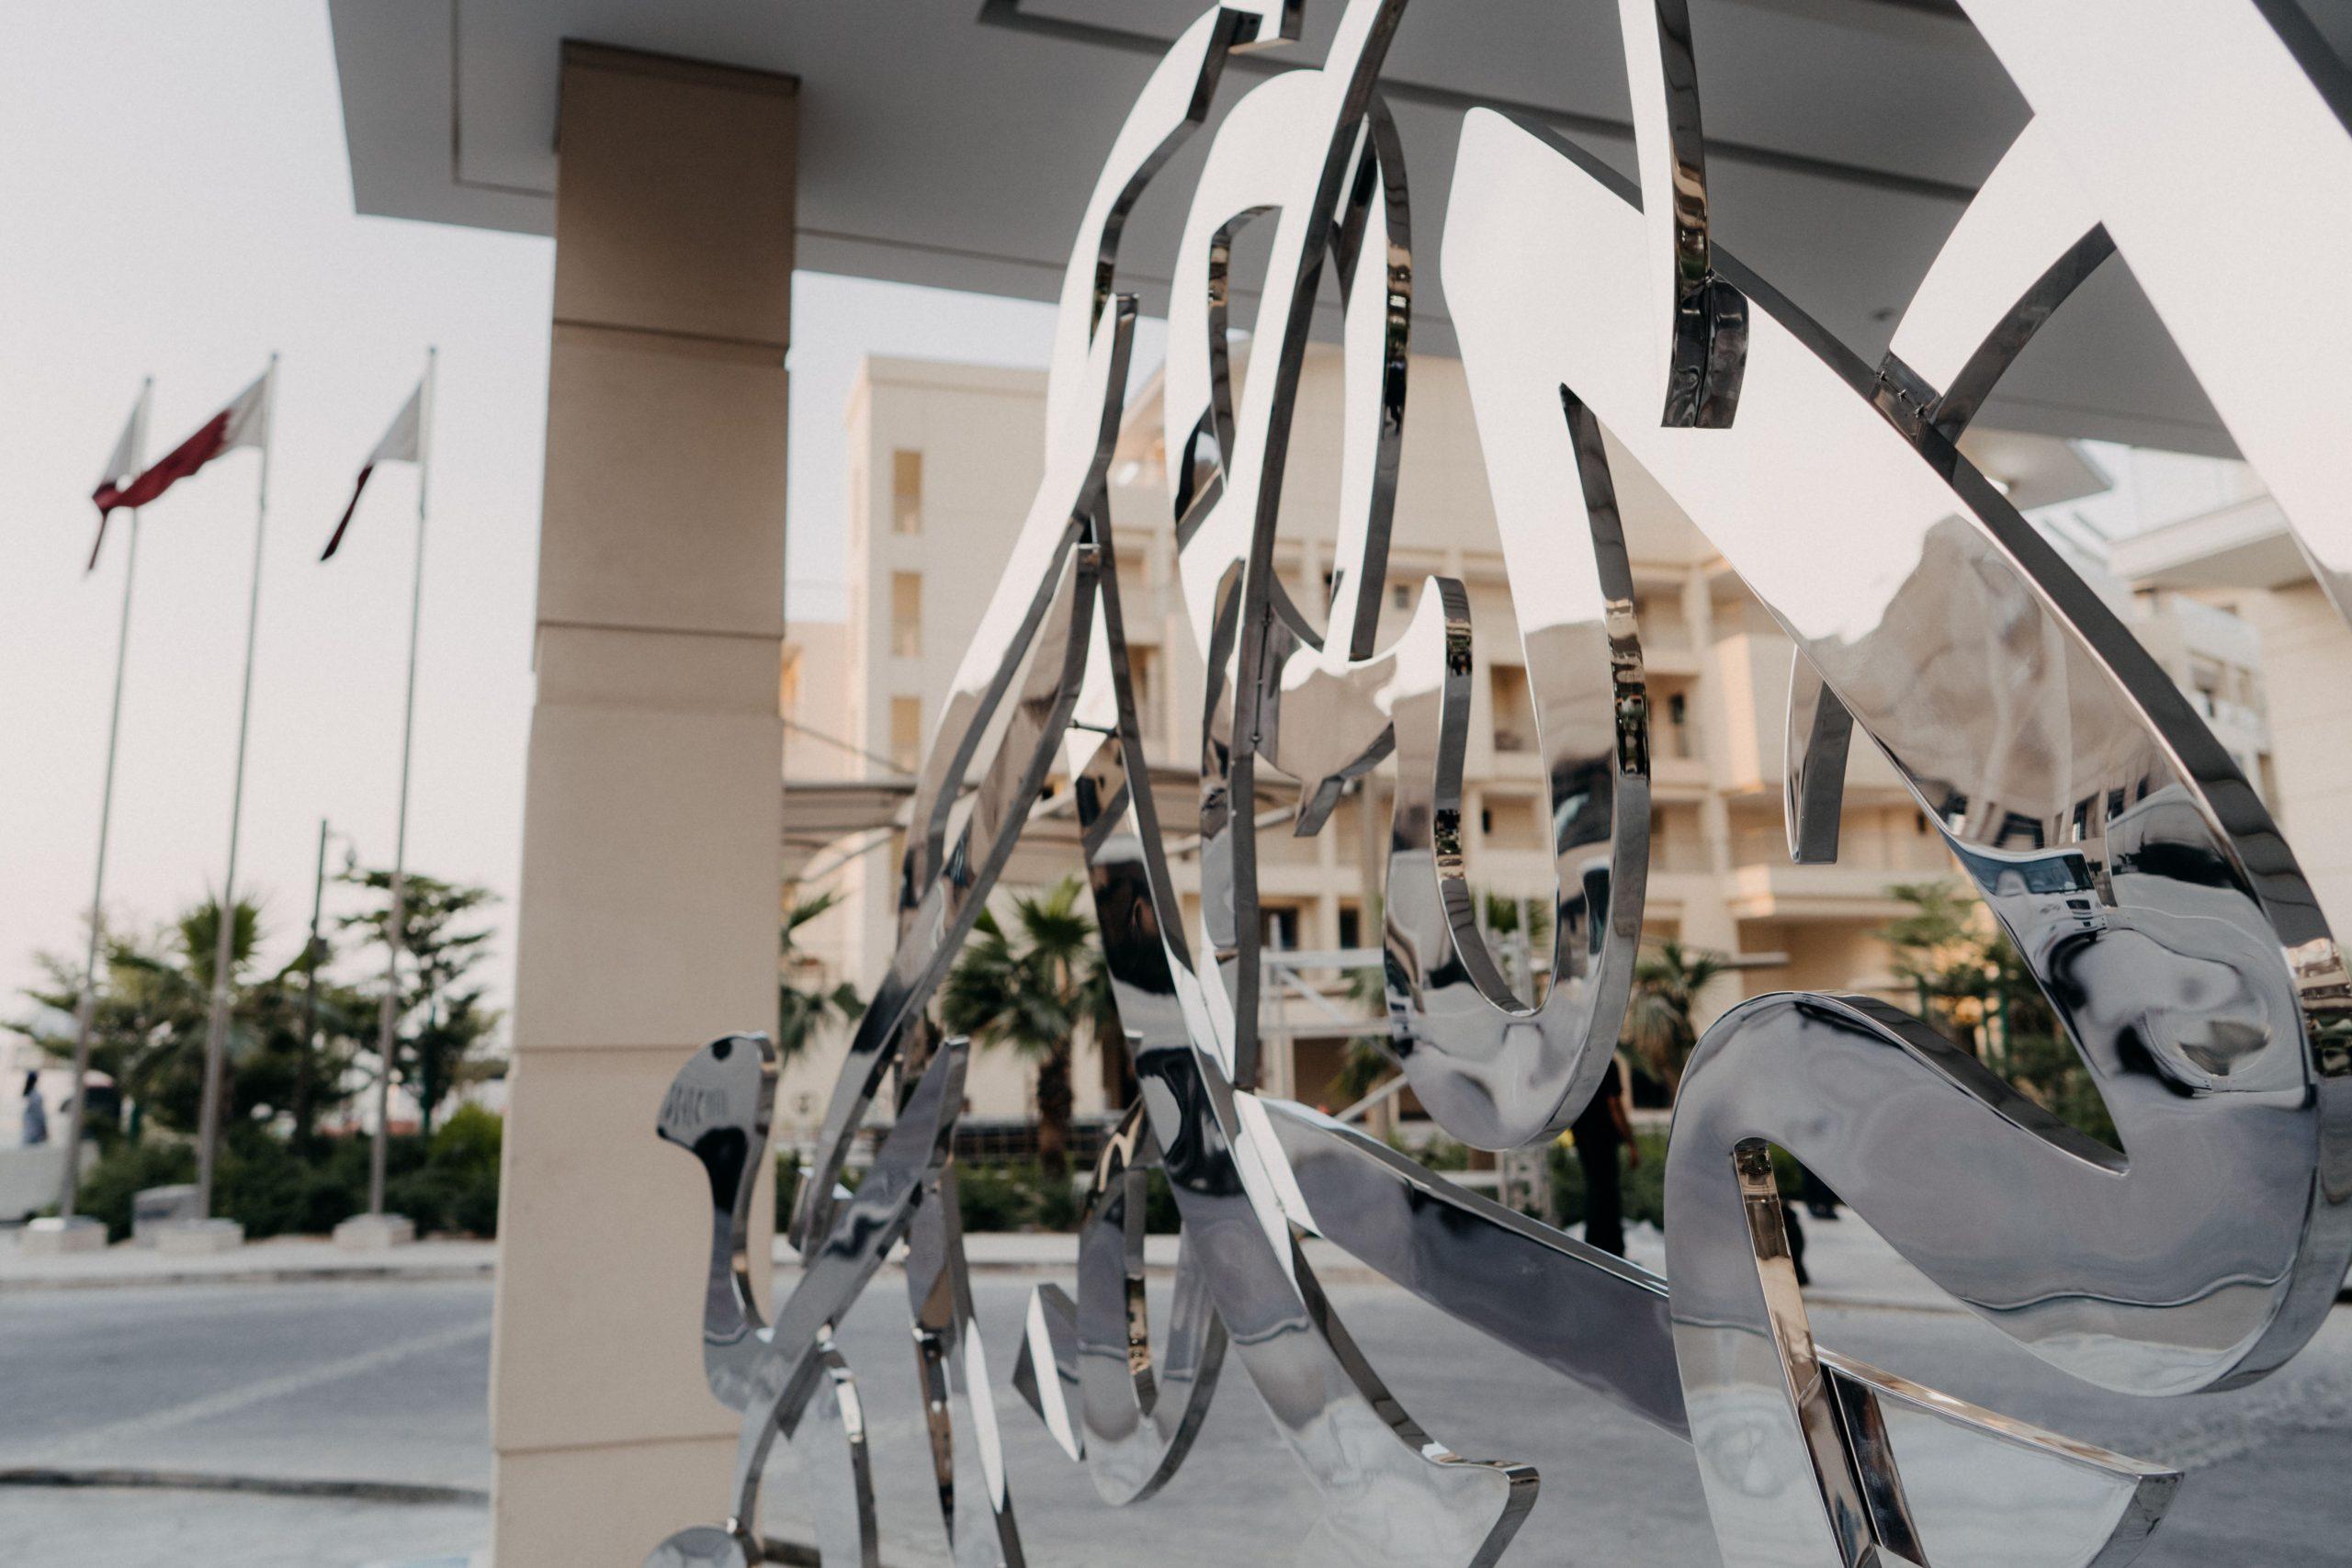 Calligraphy Sculpture